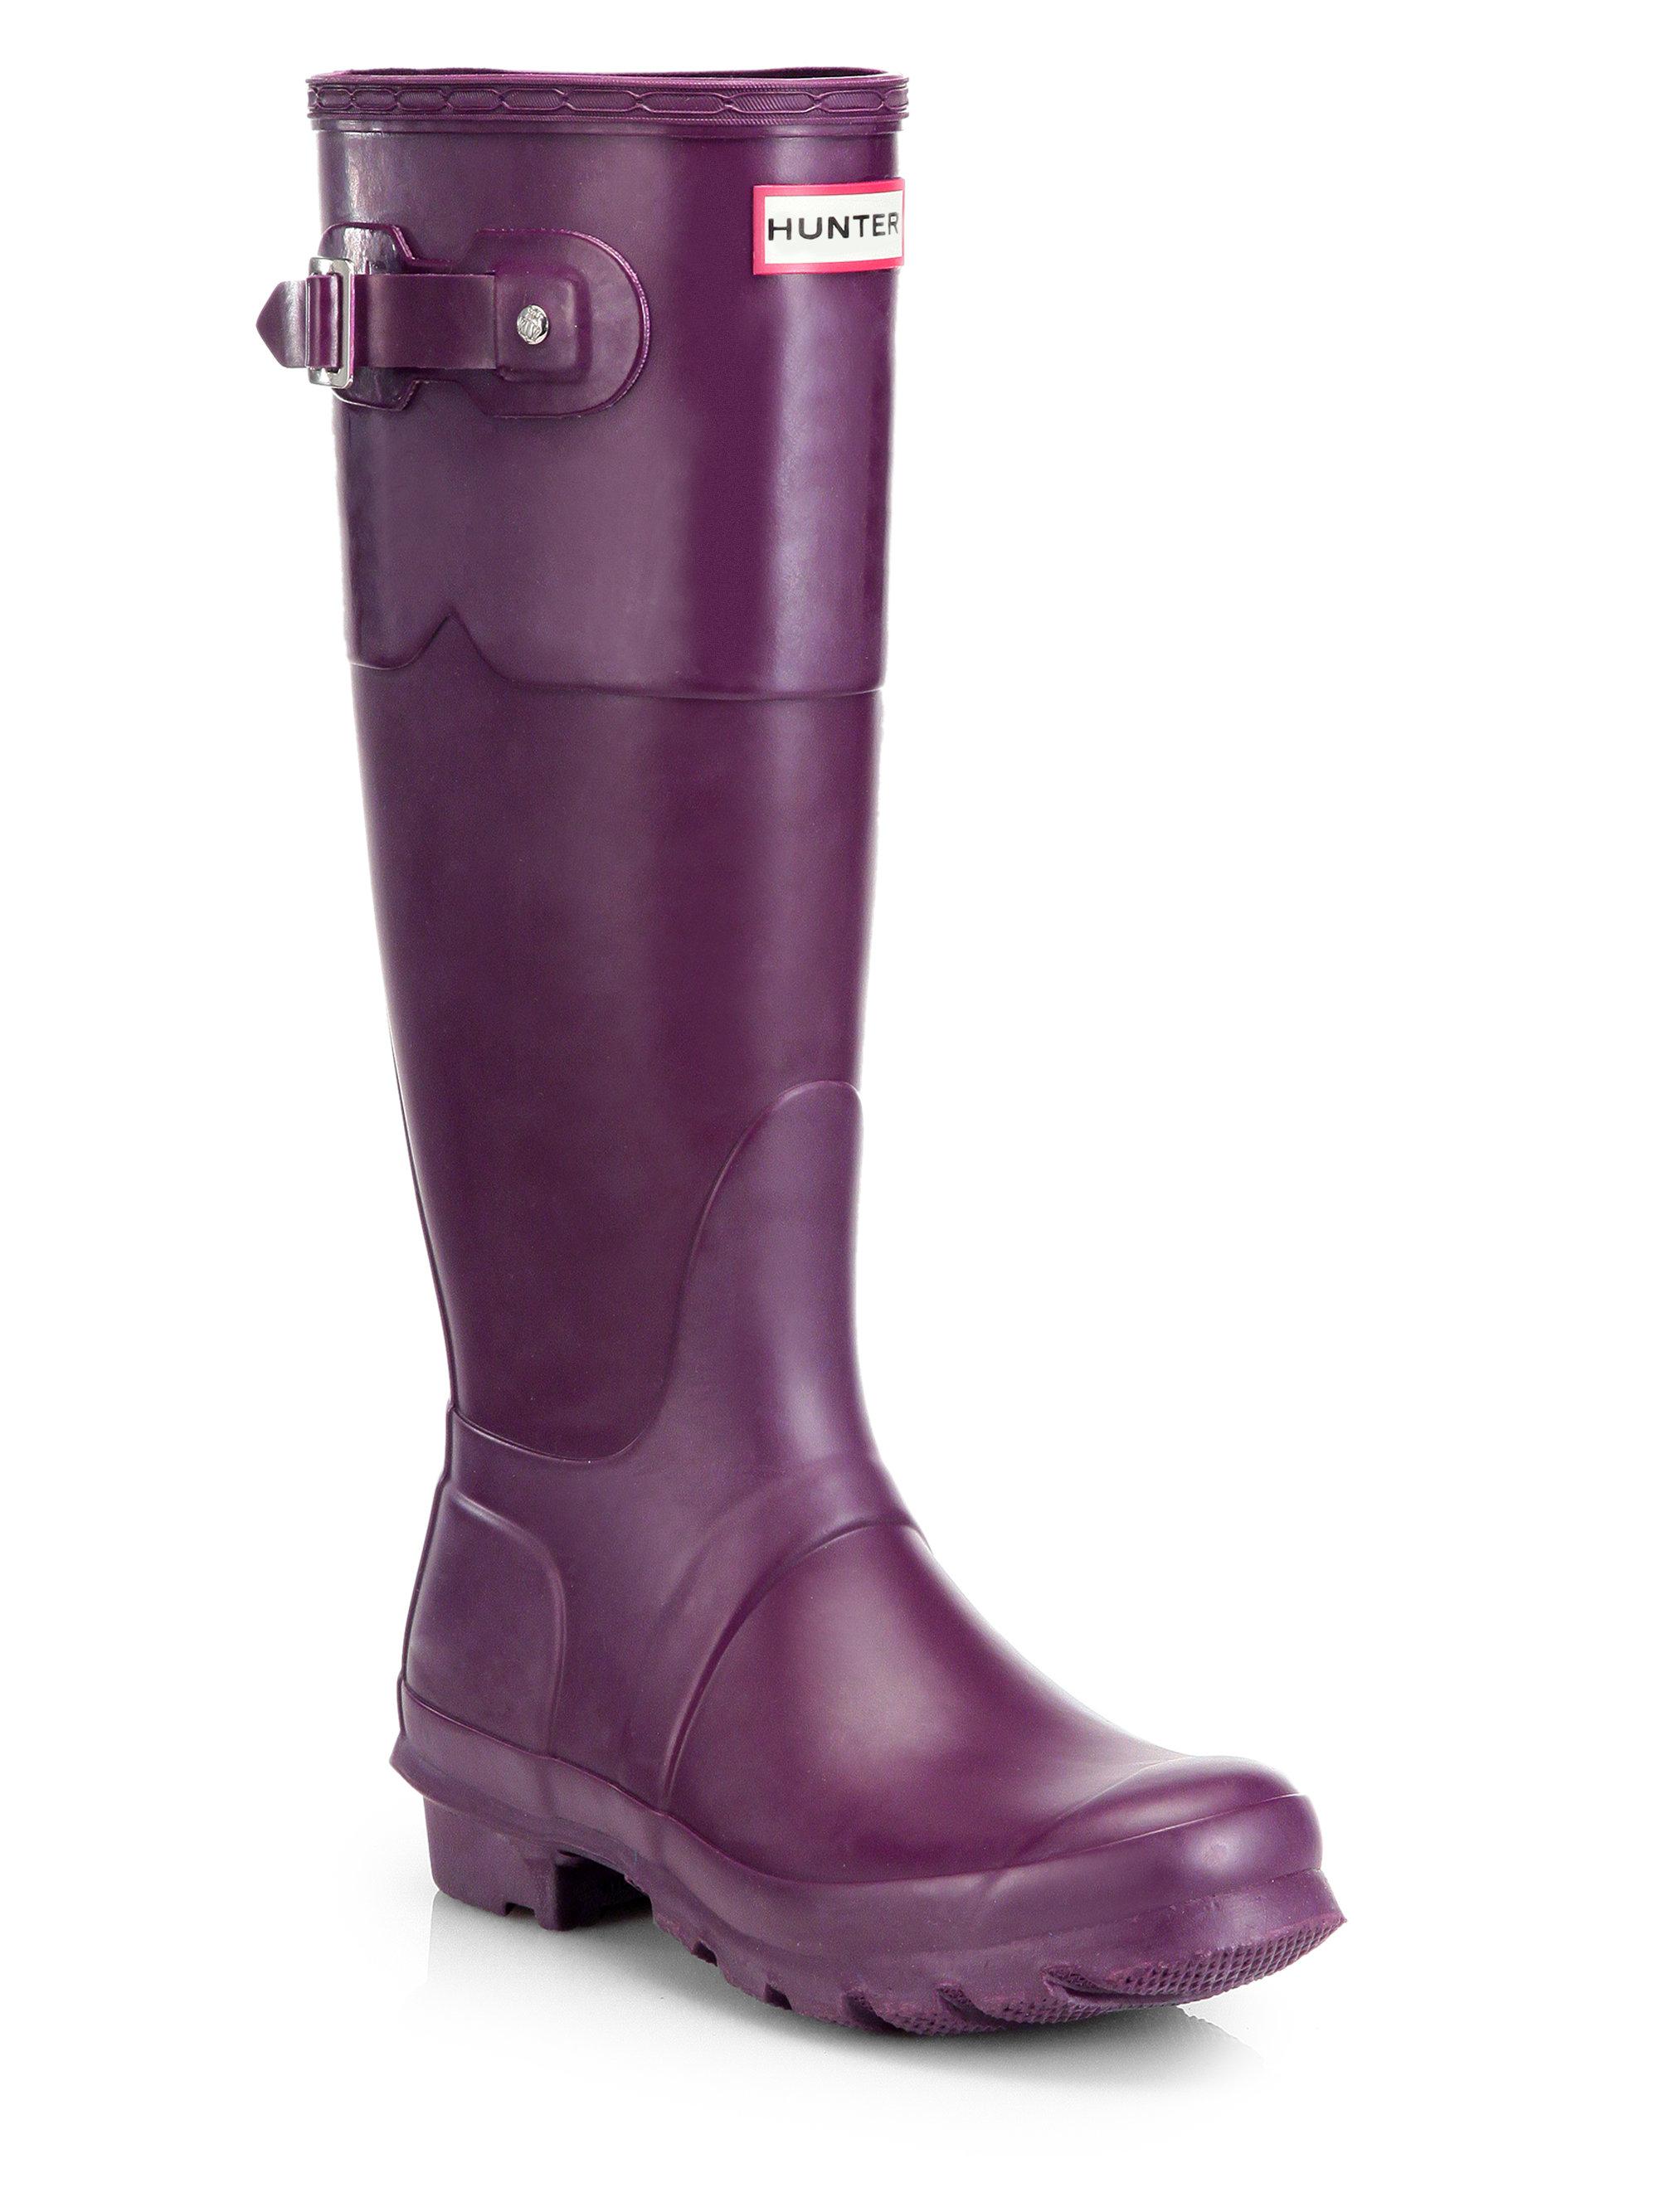 hunter original rubber rain boots in purple bright plum lyst. Black Bedroom Furniture Sets. Home Design Ideas